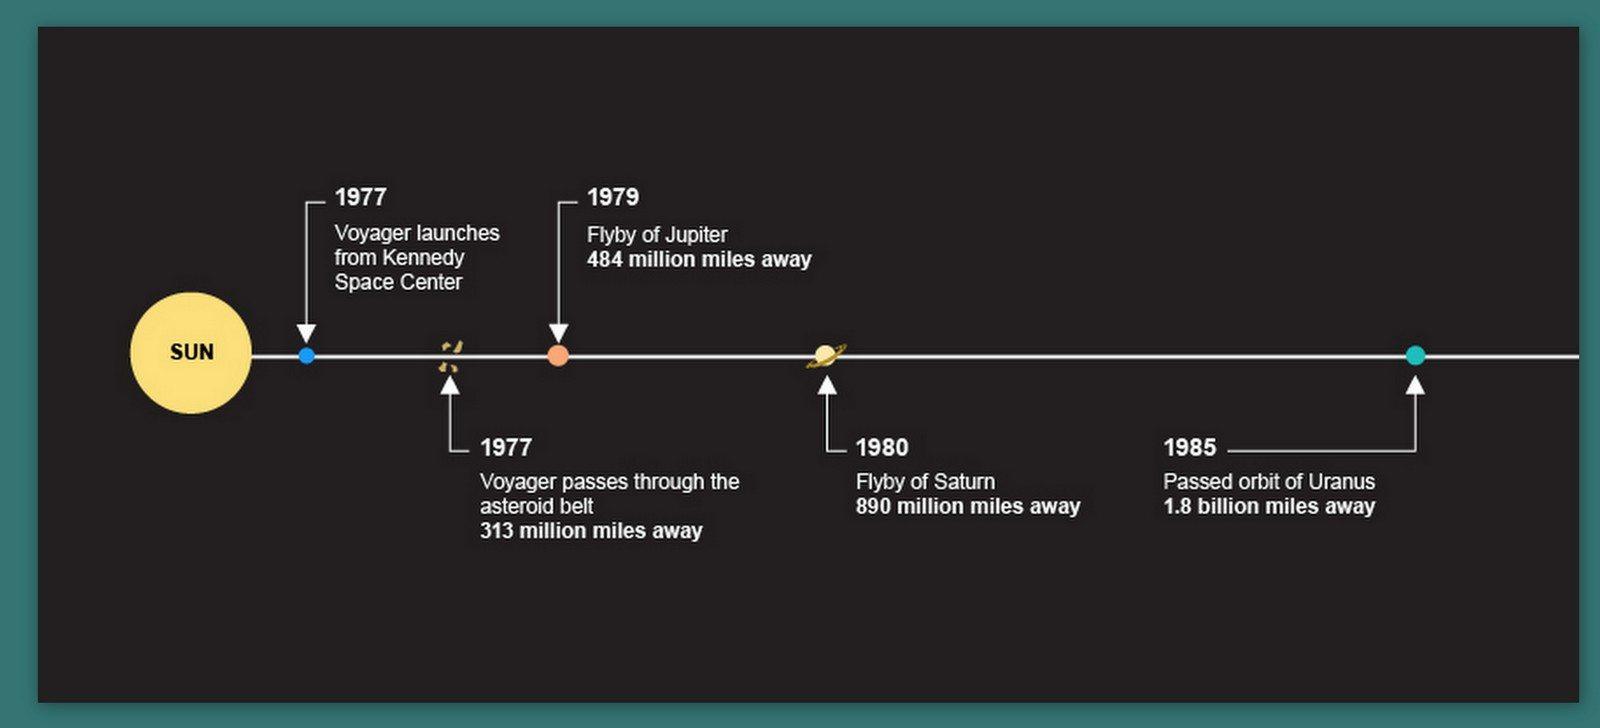 Imagine: Voyager Spacecaft trigectory